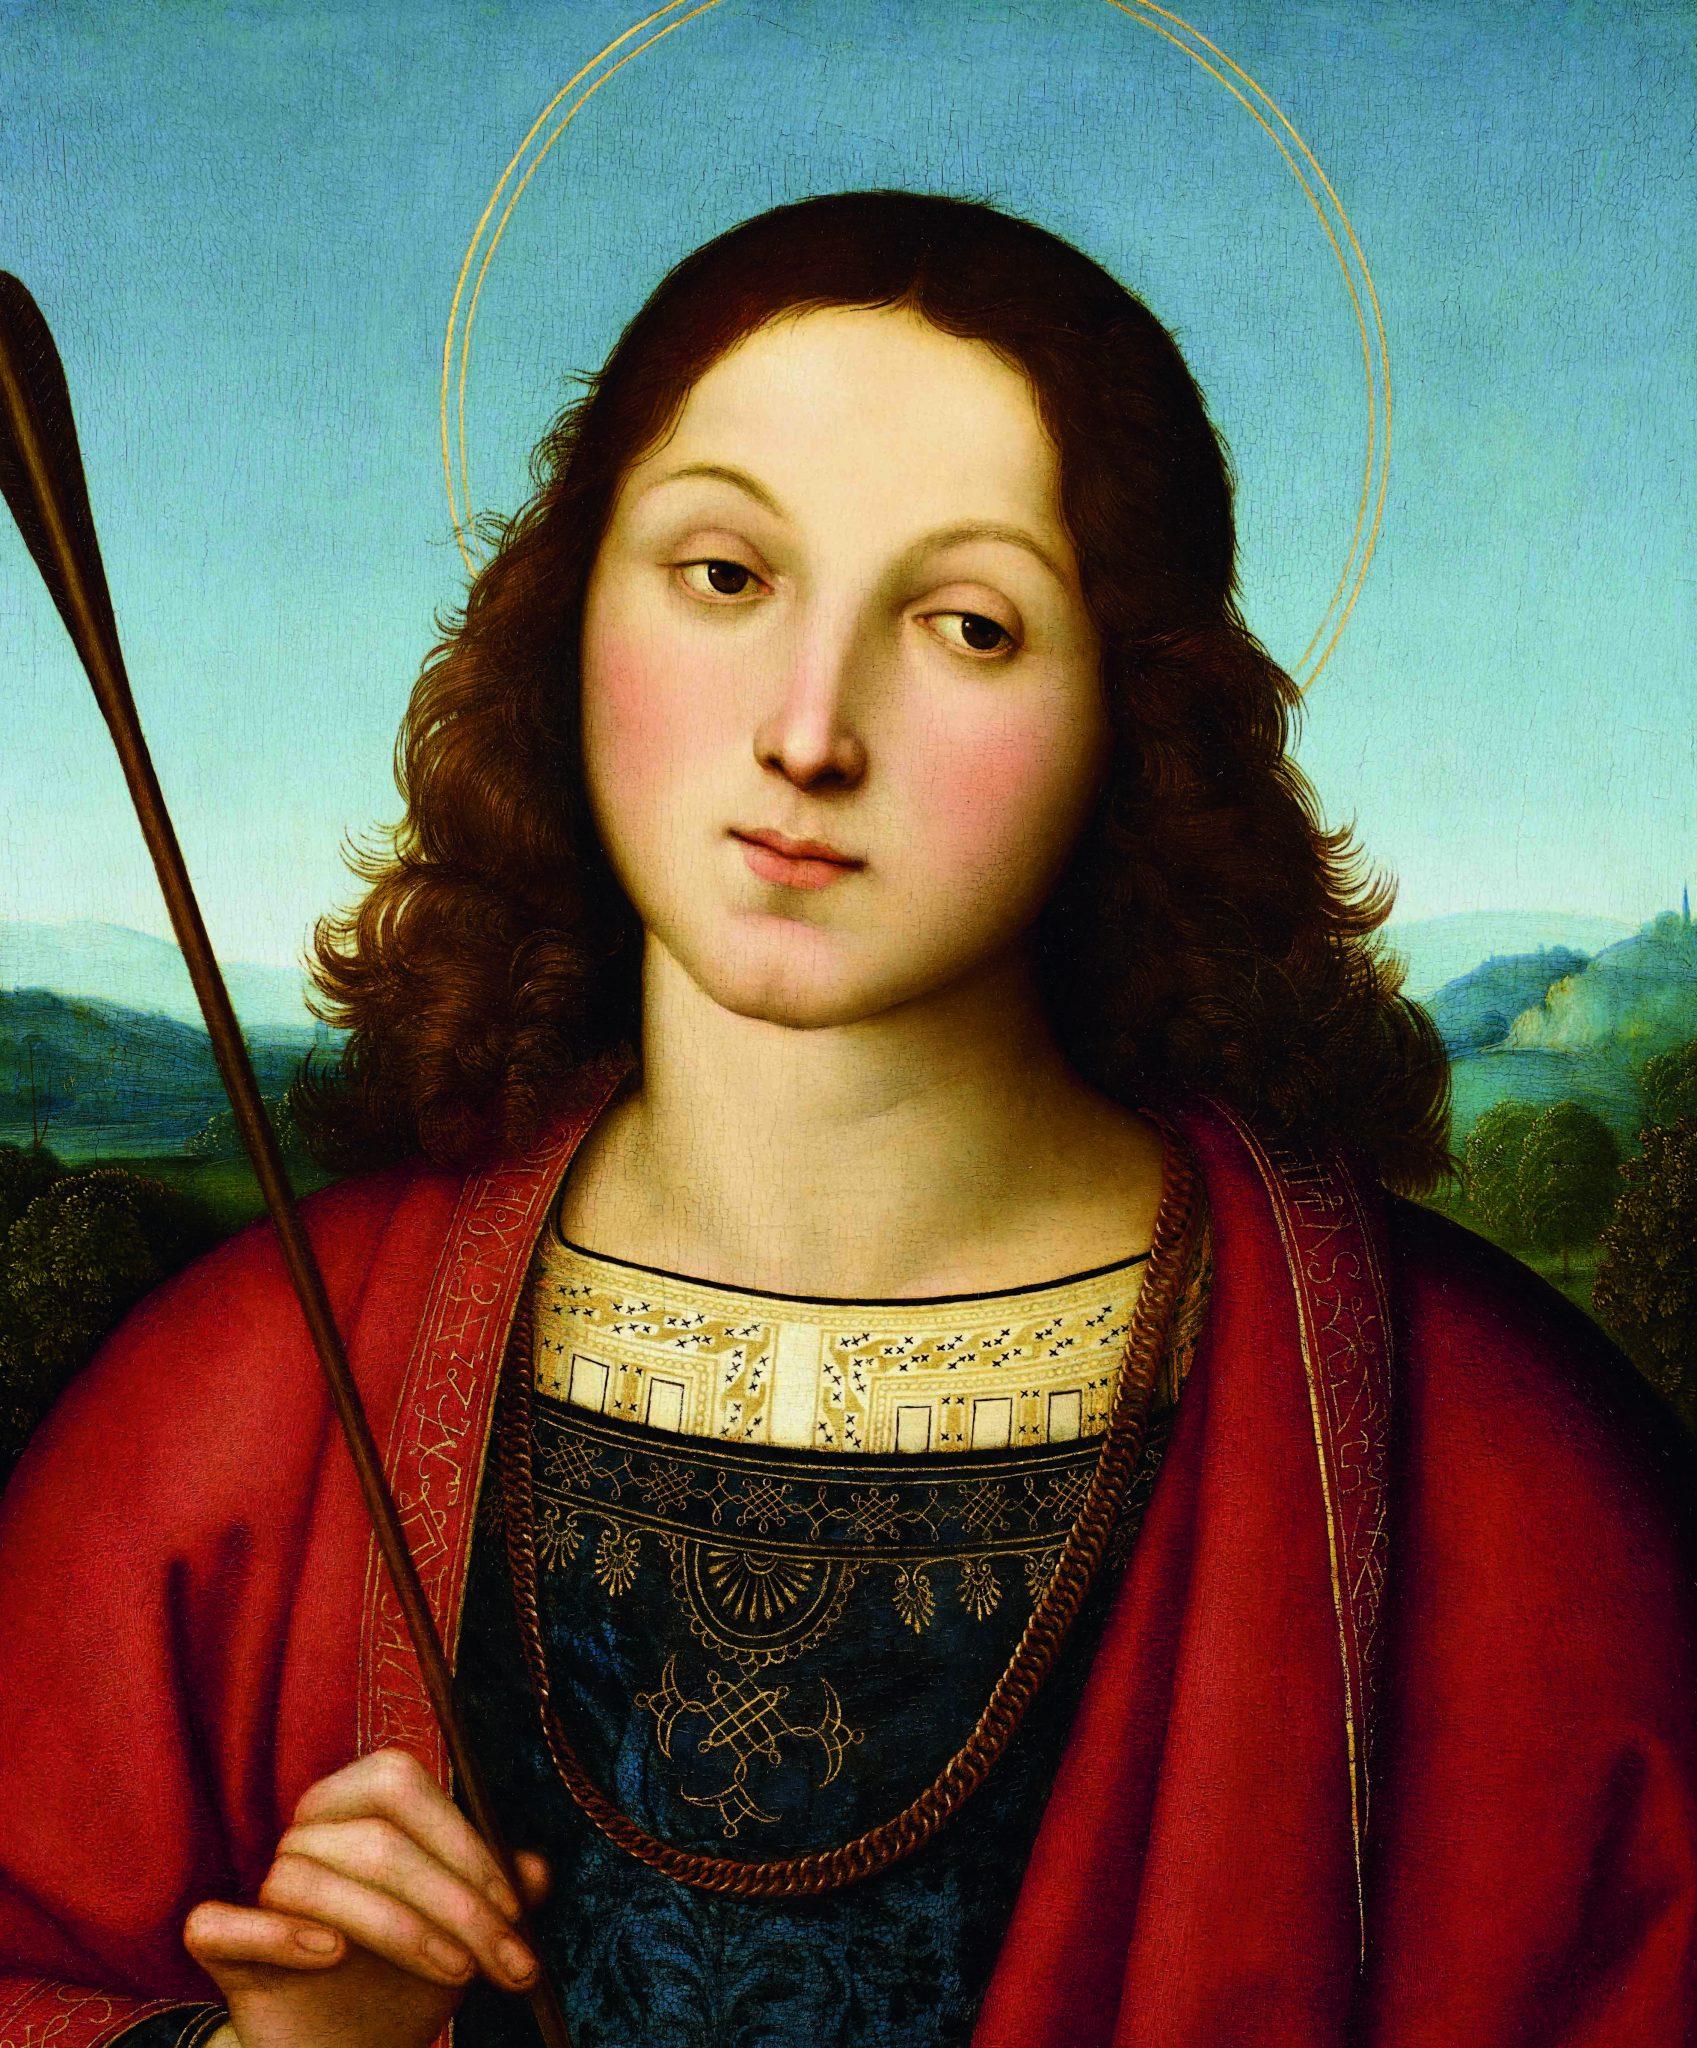 Raffaello Sanzio, San Sebastiano, circa 1502-1503